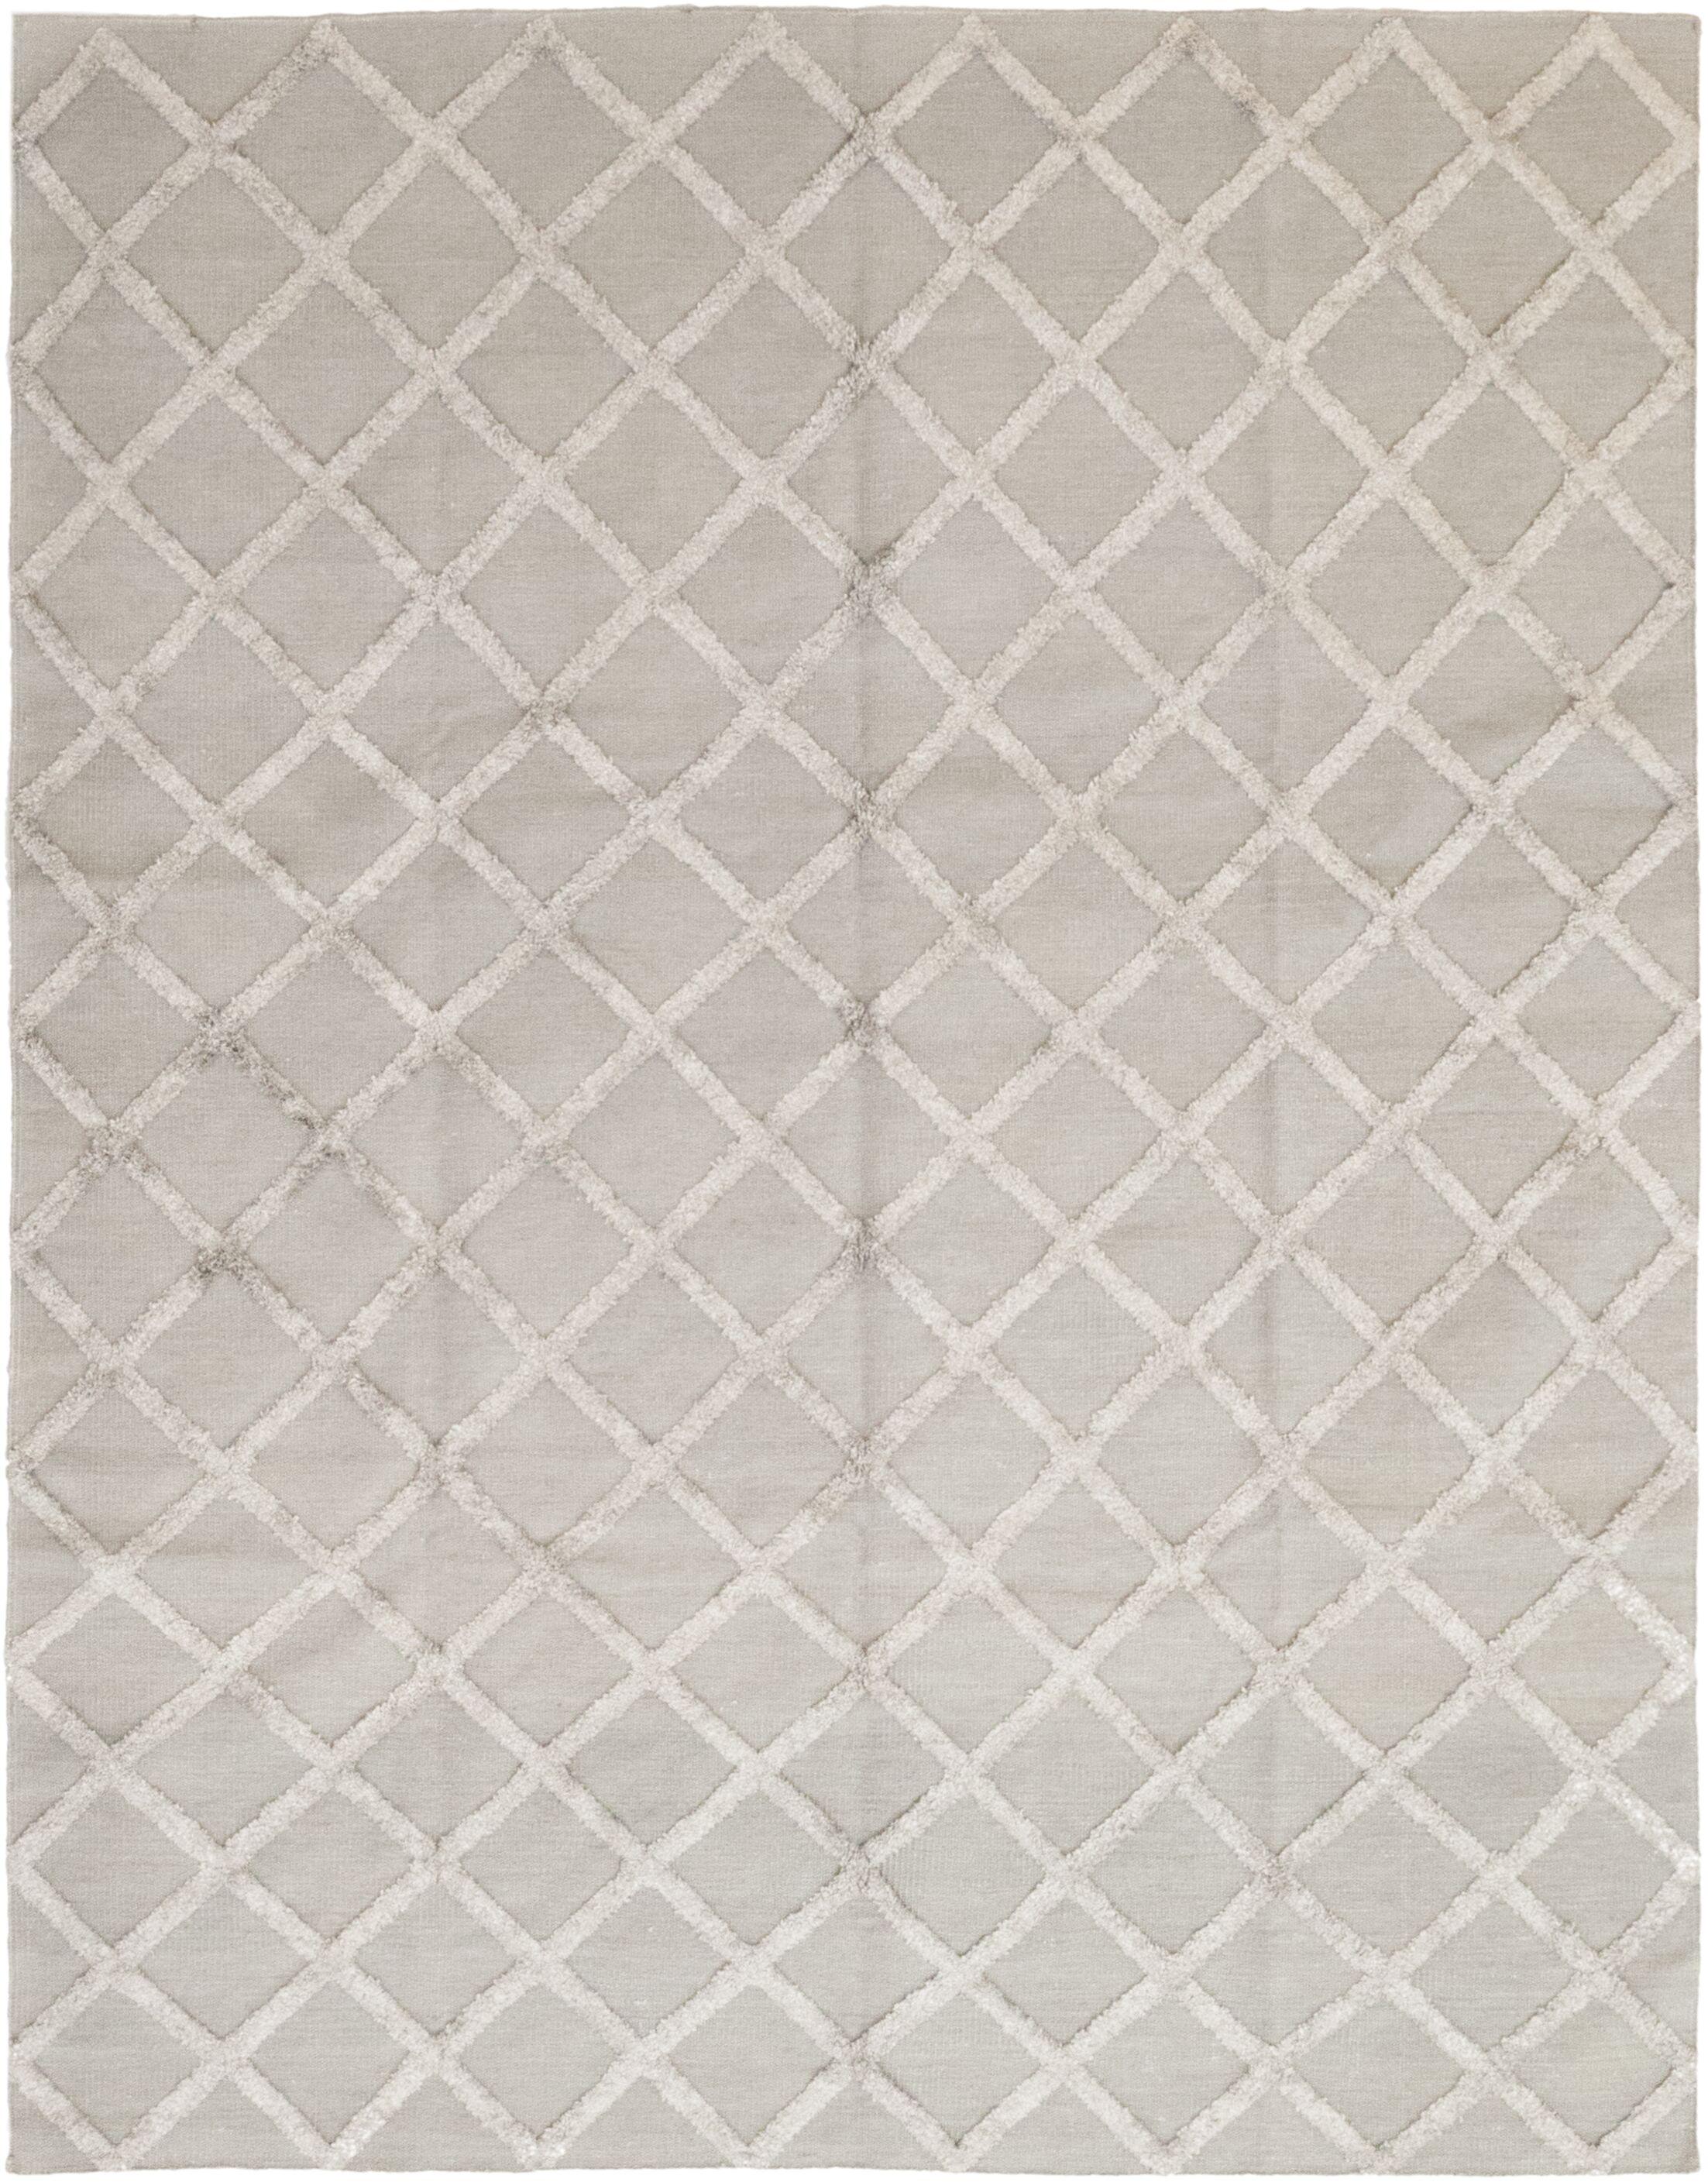 One-of-a-Kind Ellenberger Hand-Knotted Wool/Silk Beige Indoor Area Rug